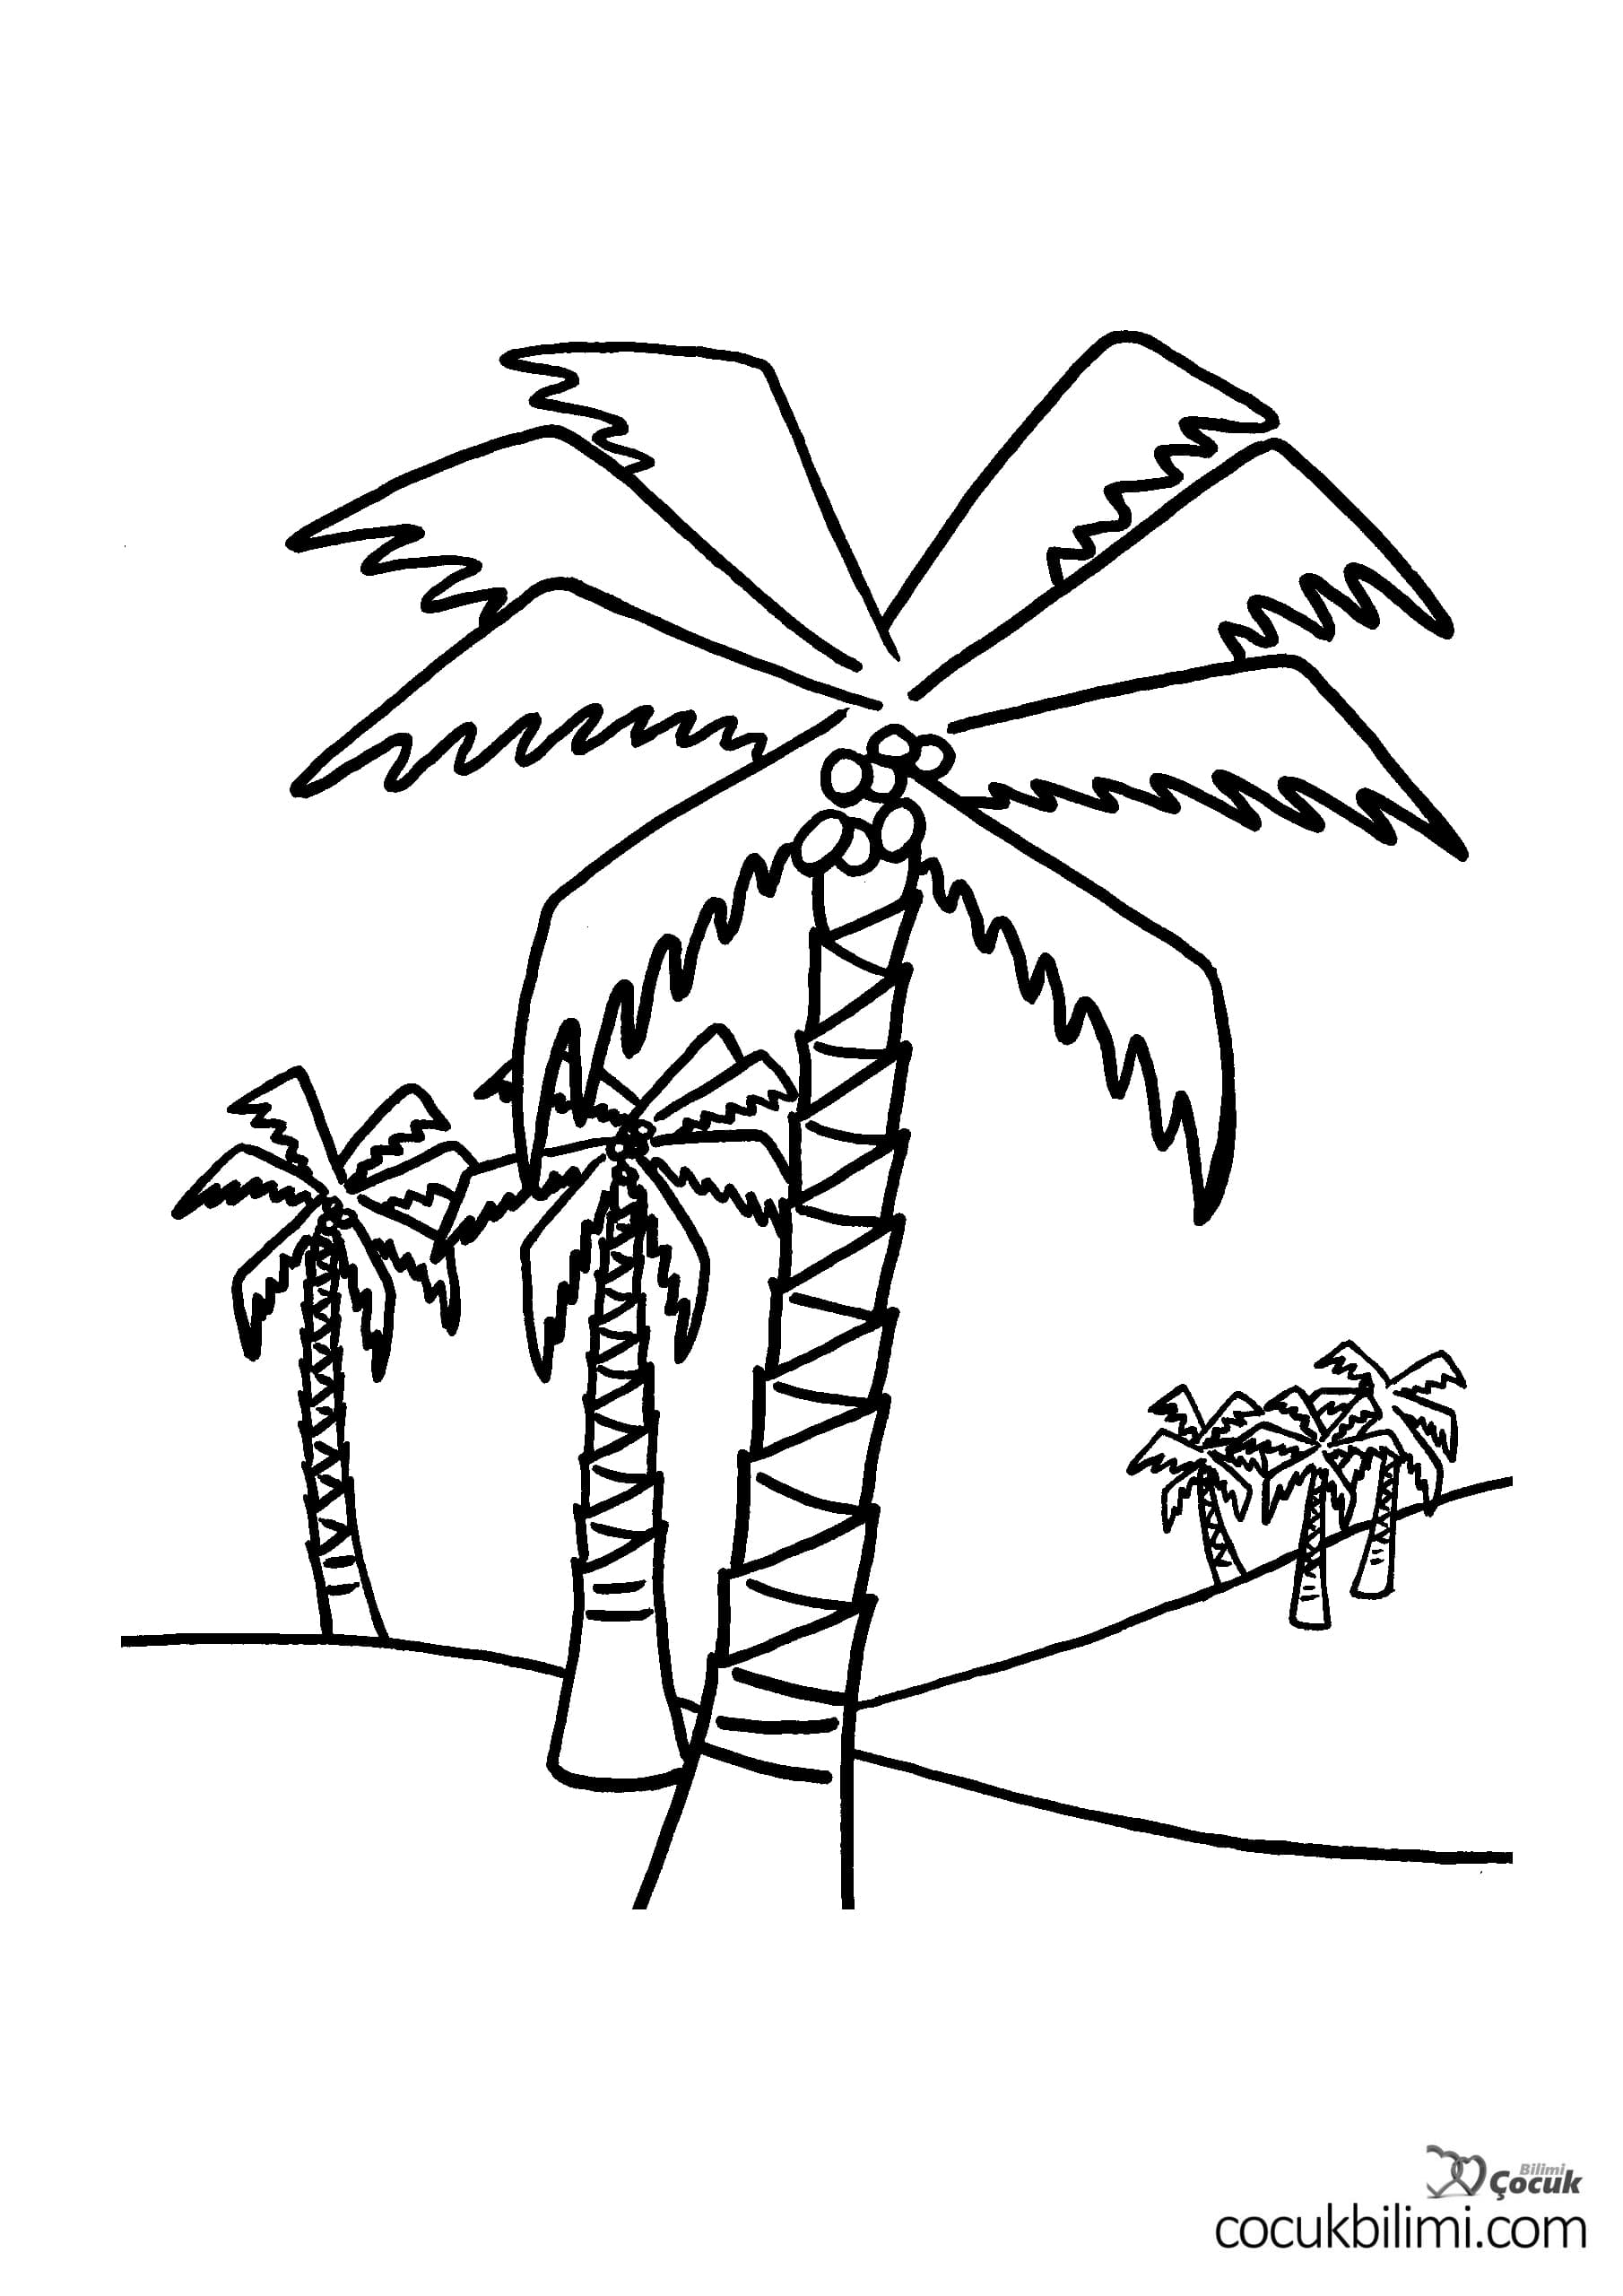 palmiye-boyama